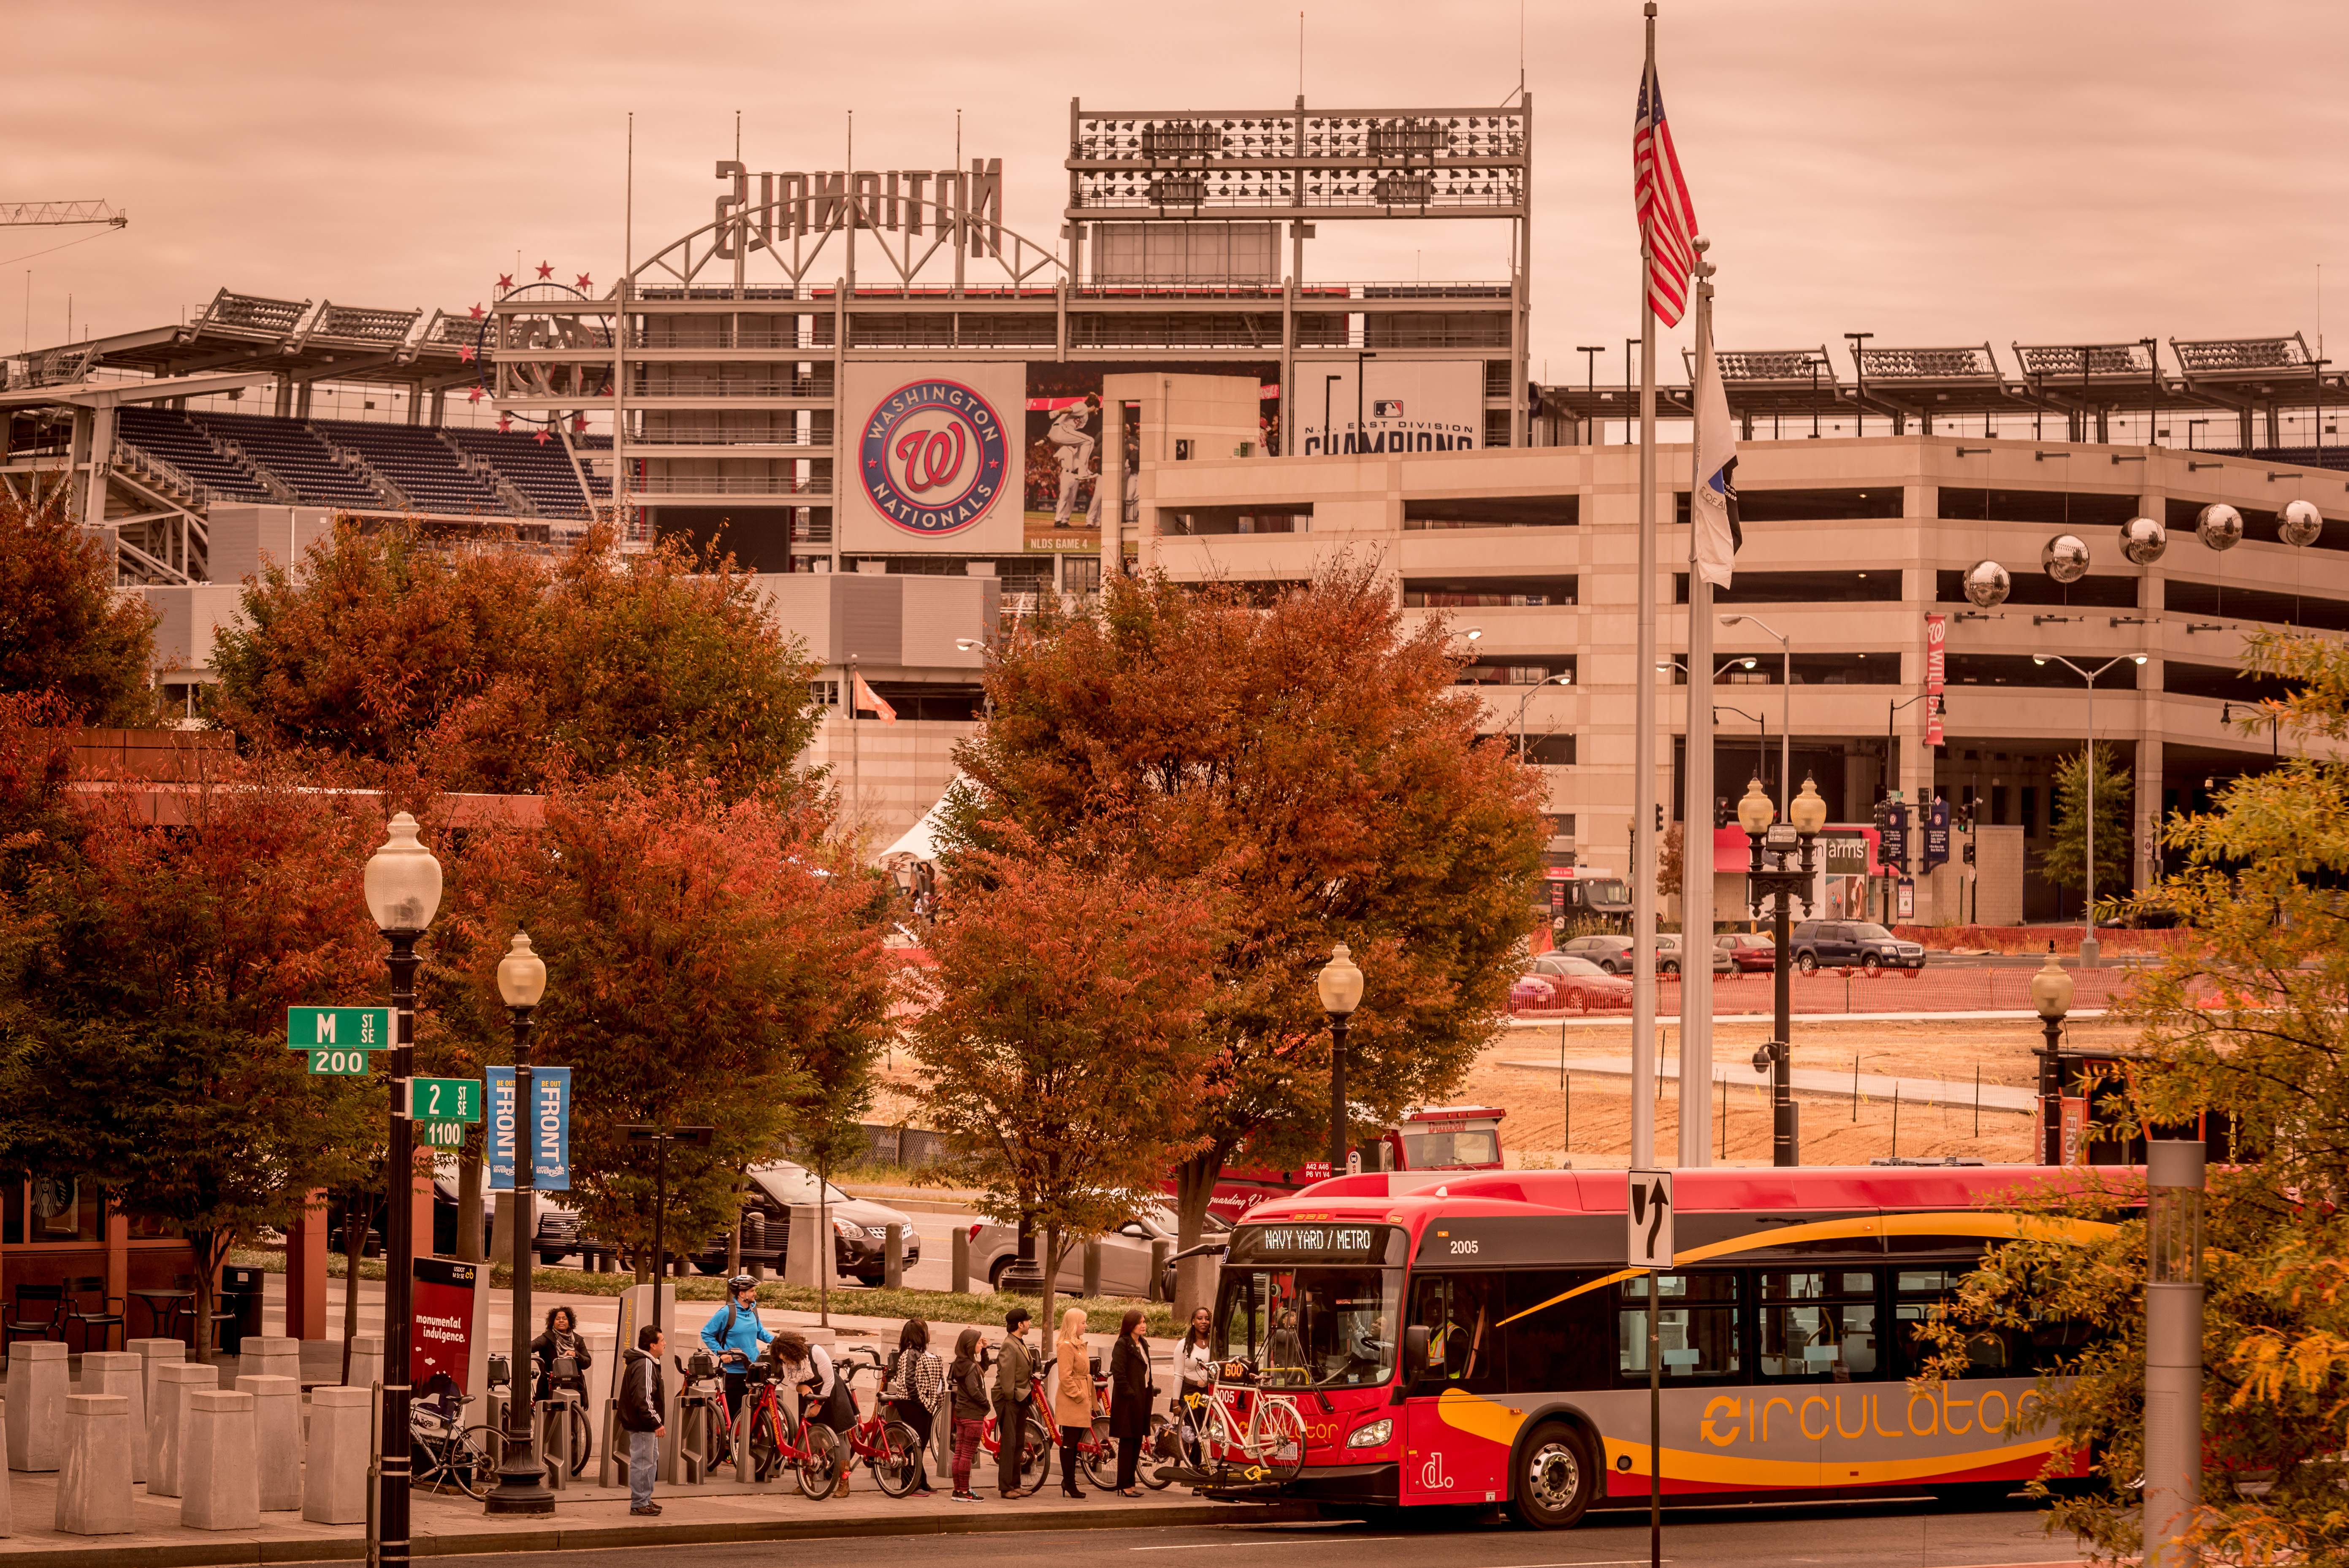 DC_Circulator_Fall2015_USNY_Nats_Baseball_stadium_NorthBound (11)